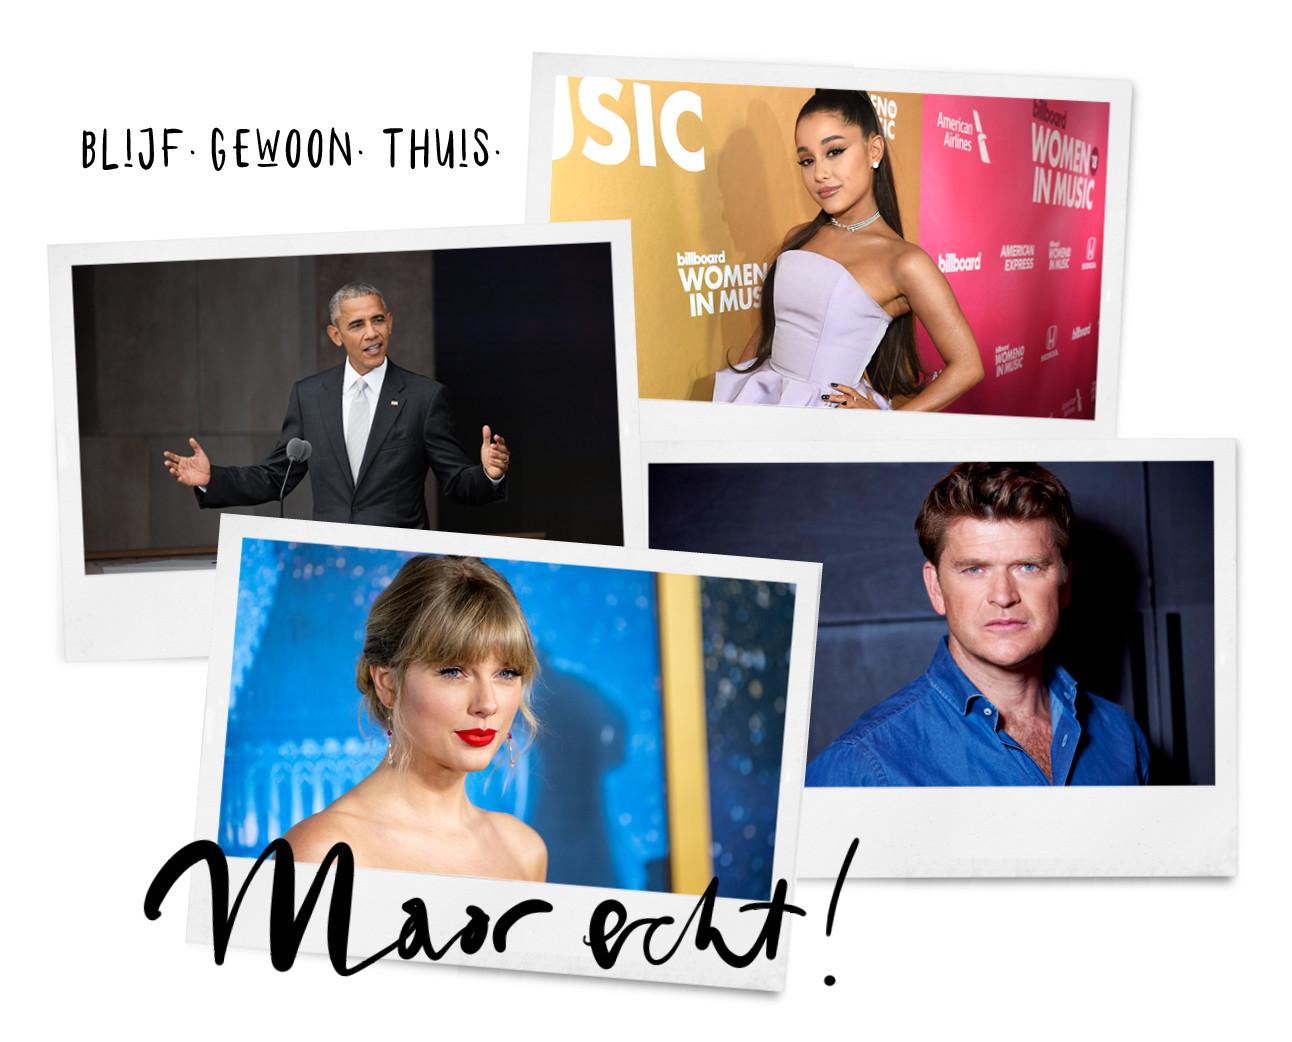 Barack obama, Taylor Swift, Ariana Grande, Beau van erven dorens